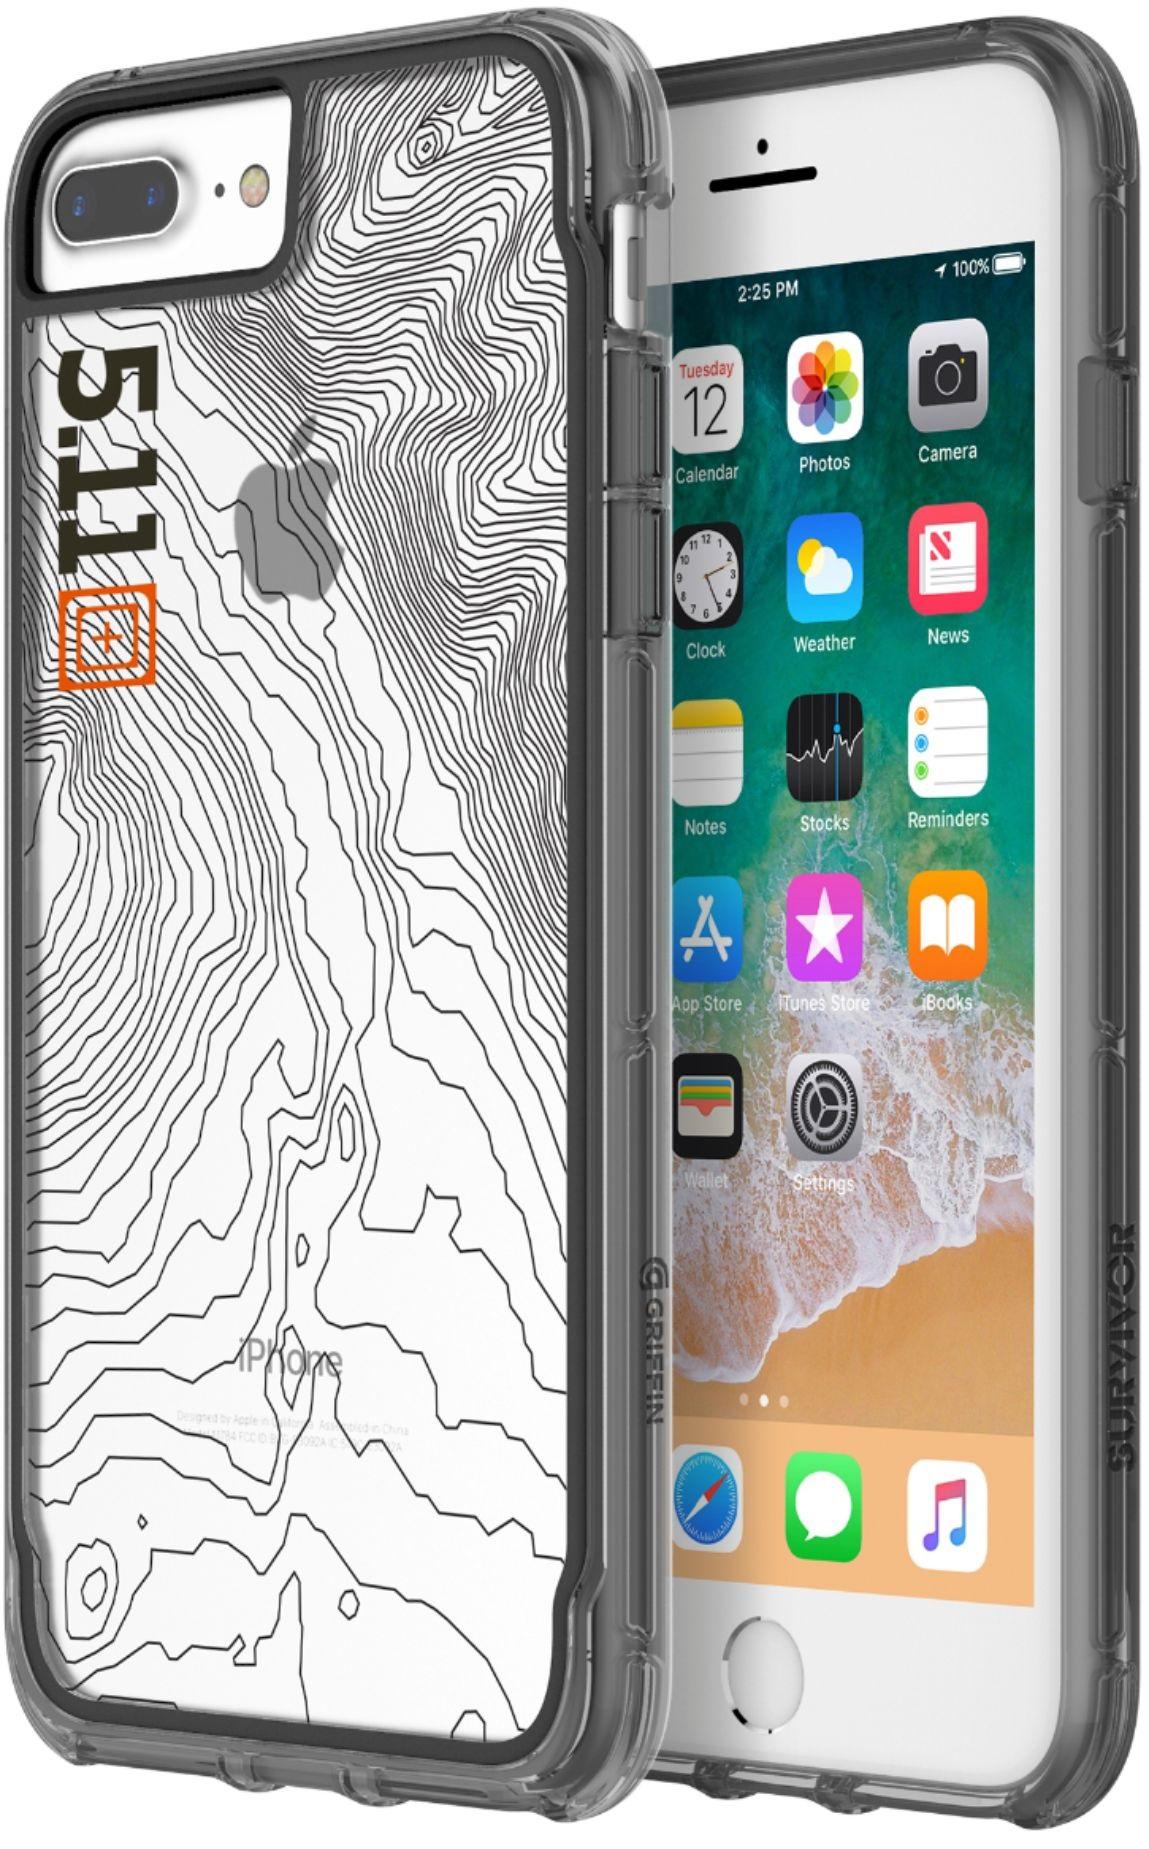 769147e16df Griffin Survivor 5.11 Tactical Edition Protective Case for iPhone 8 Plus & 7  Plus - Clear/Black/Gray